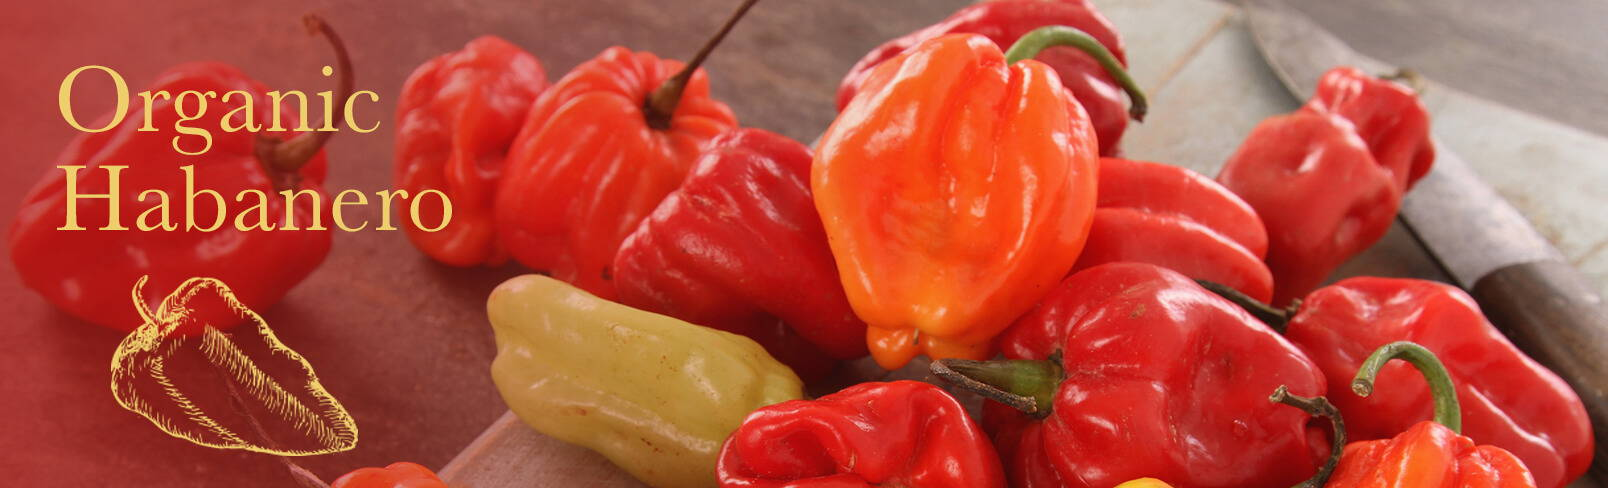 High Quality Organics Express Habanero Peppers